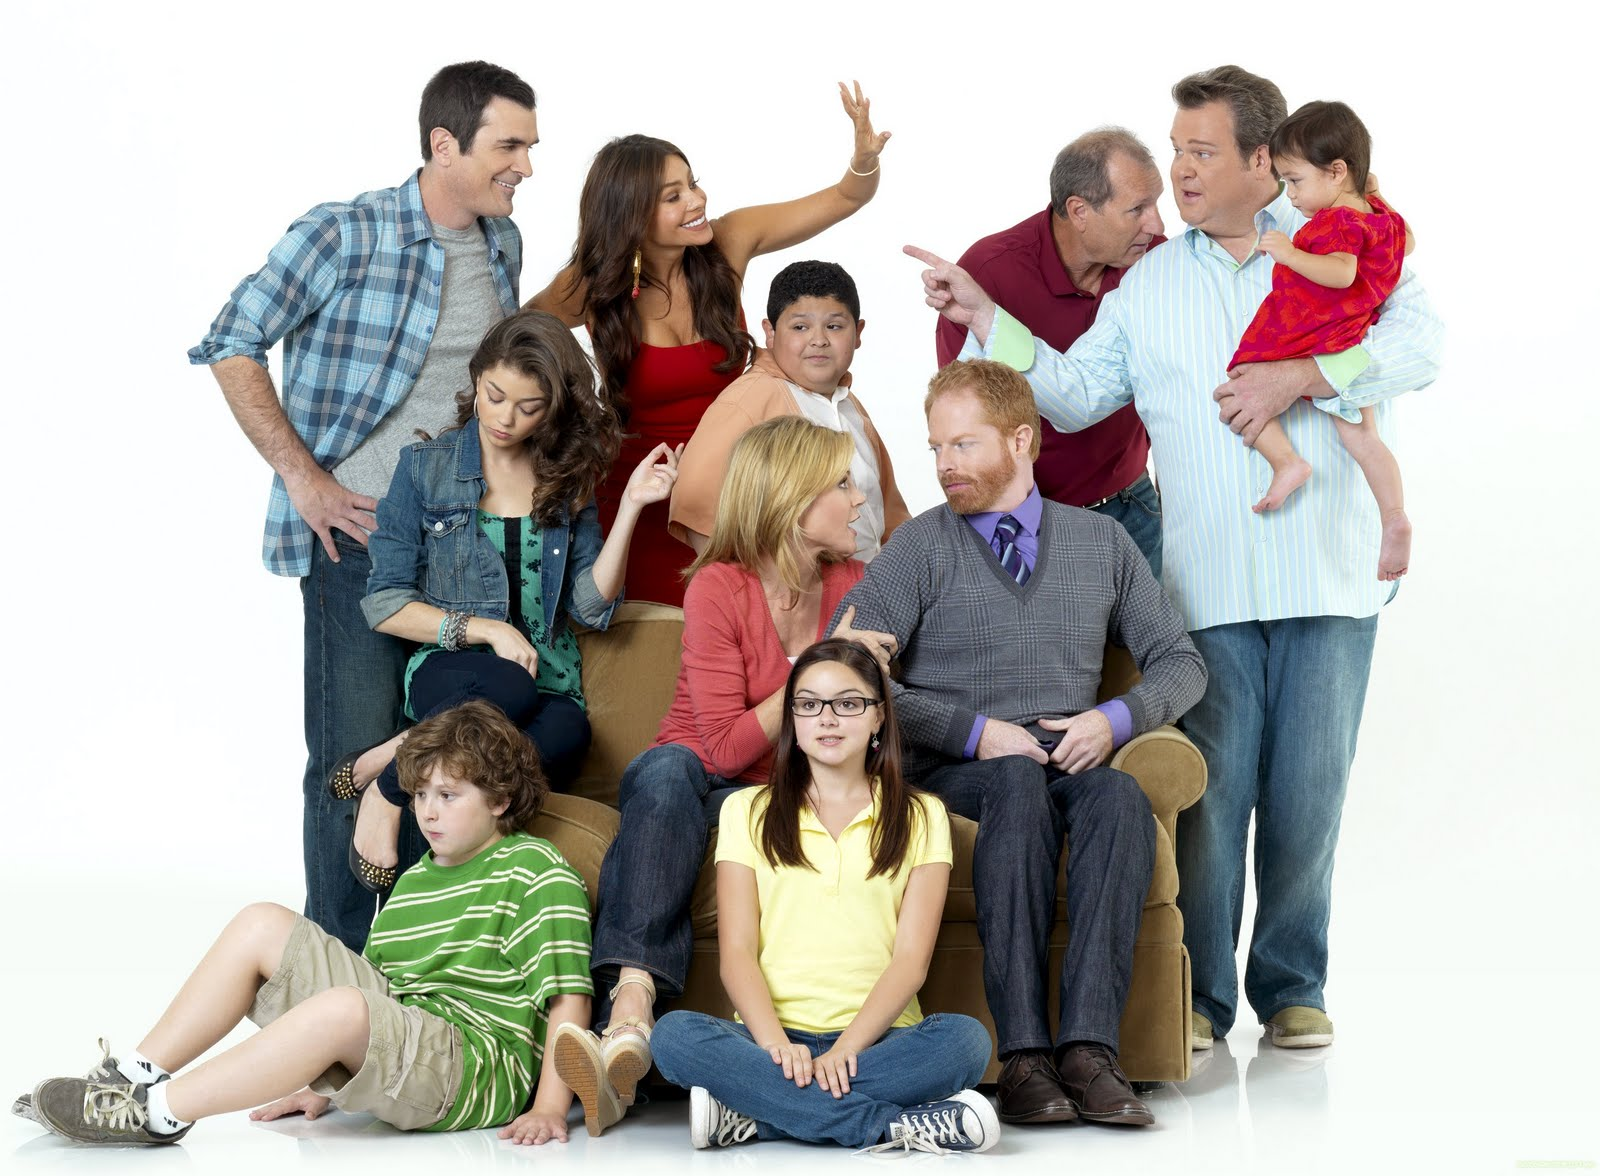 modern family - photo #15